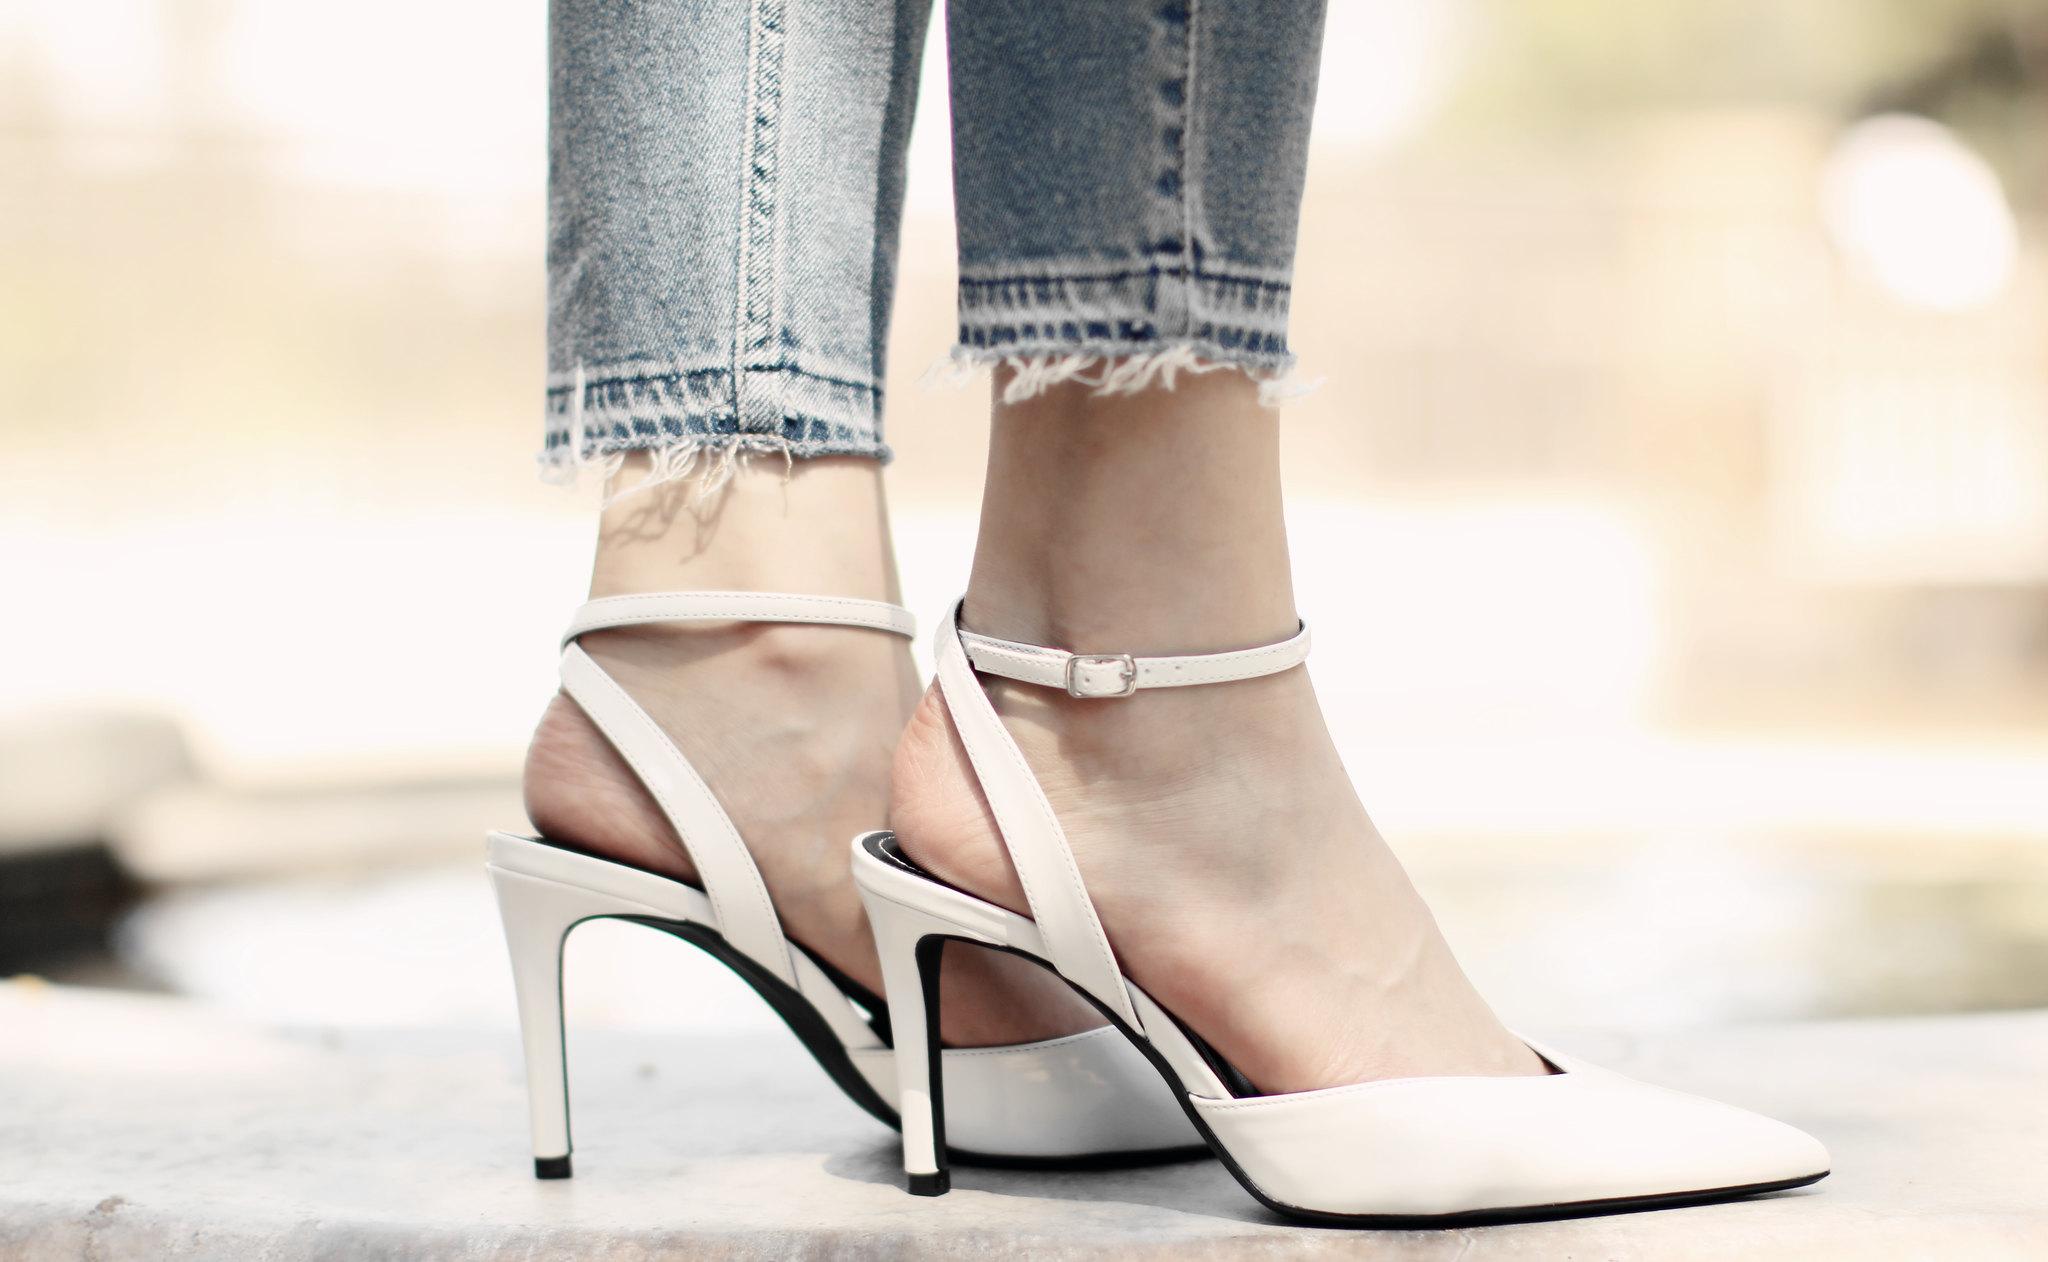 5346-ootd-fashion-style-outfitoftheday-wiwt-streetstyle-zara-bershka-hollister-basic-bohochic-summer-elizabeeetht-clothestoyouuu